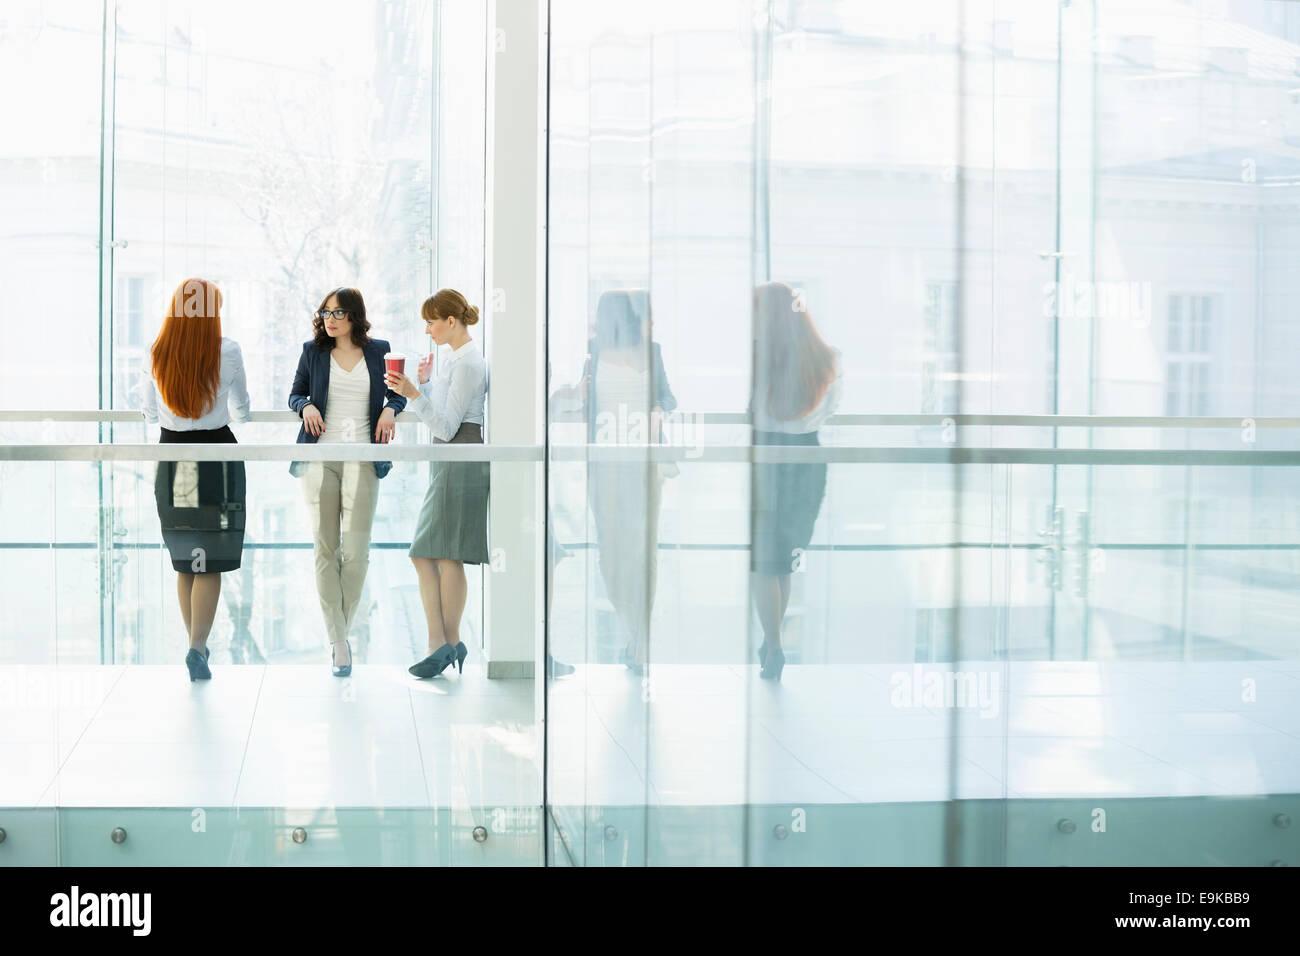 Businesswomen conversing at office hallway - Stock Image